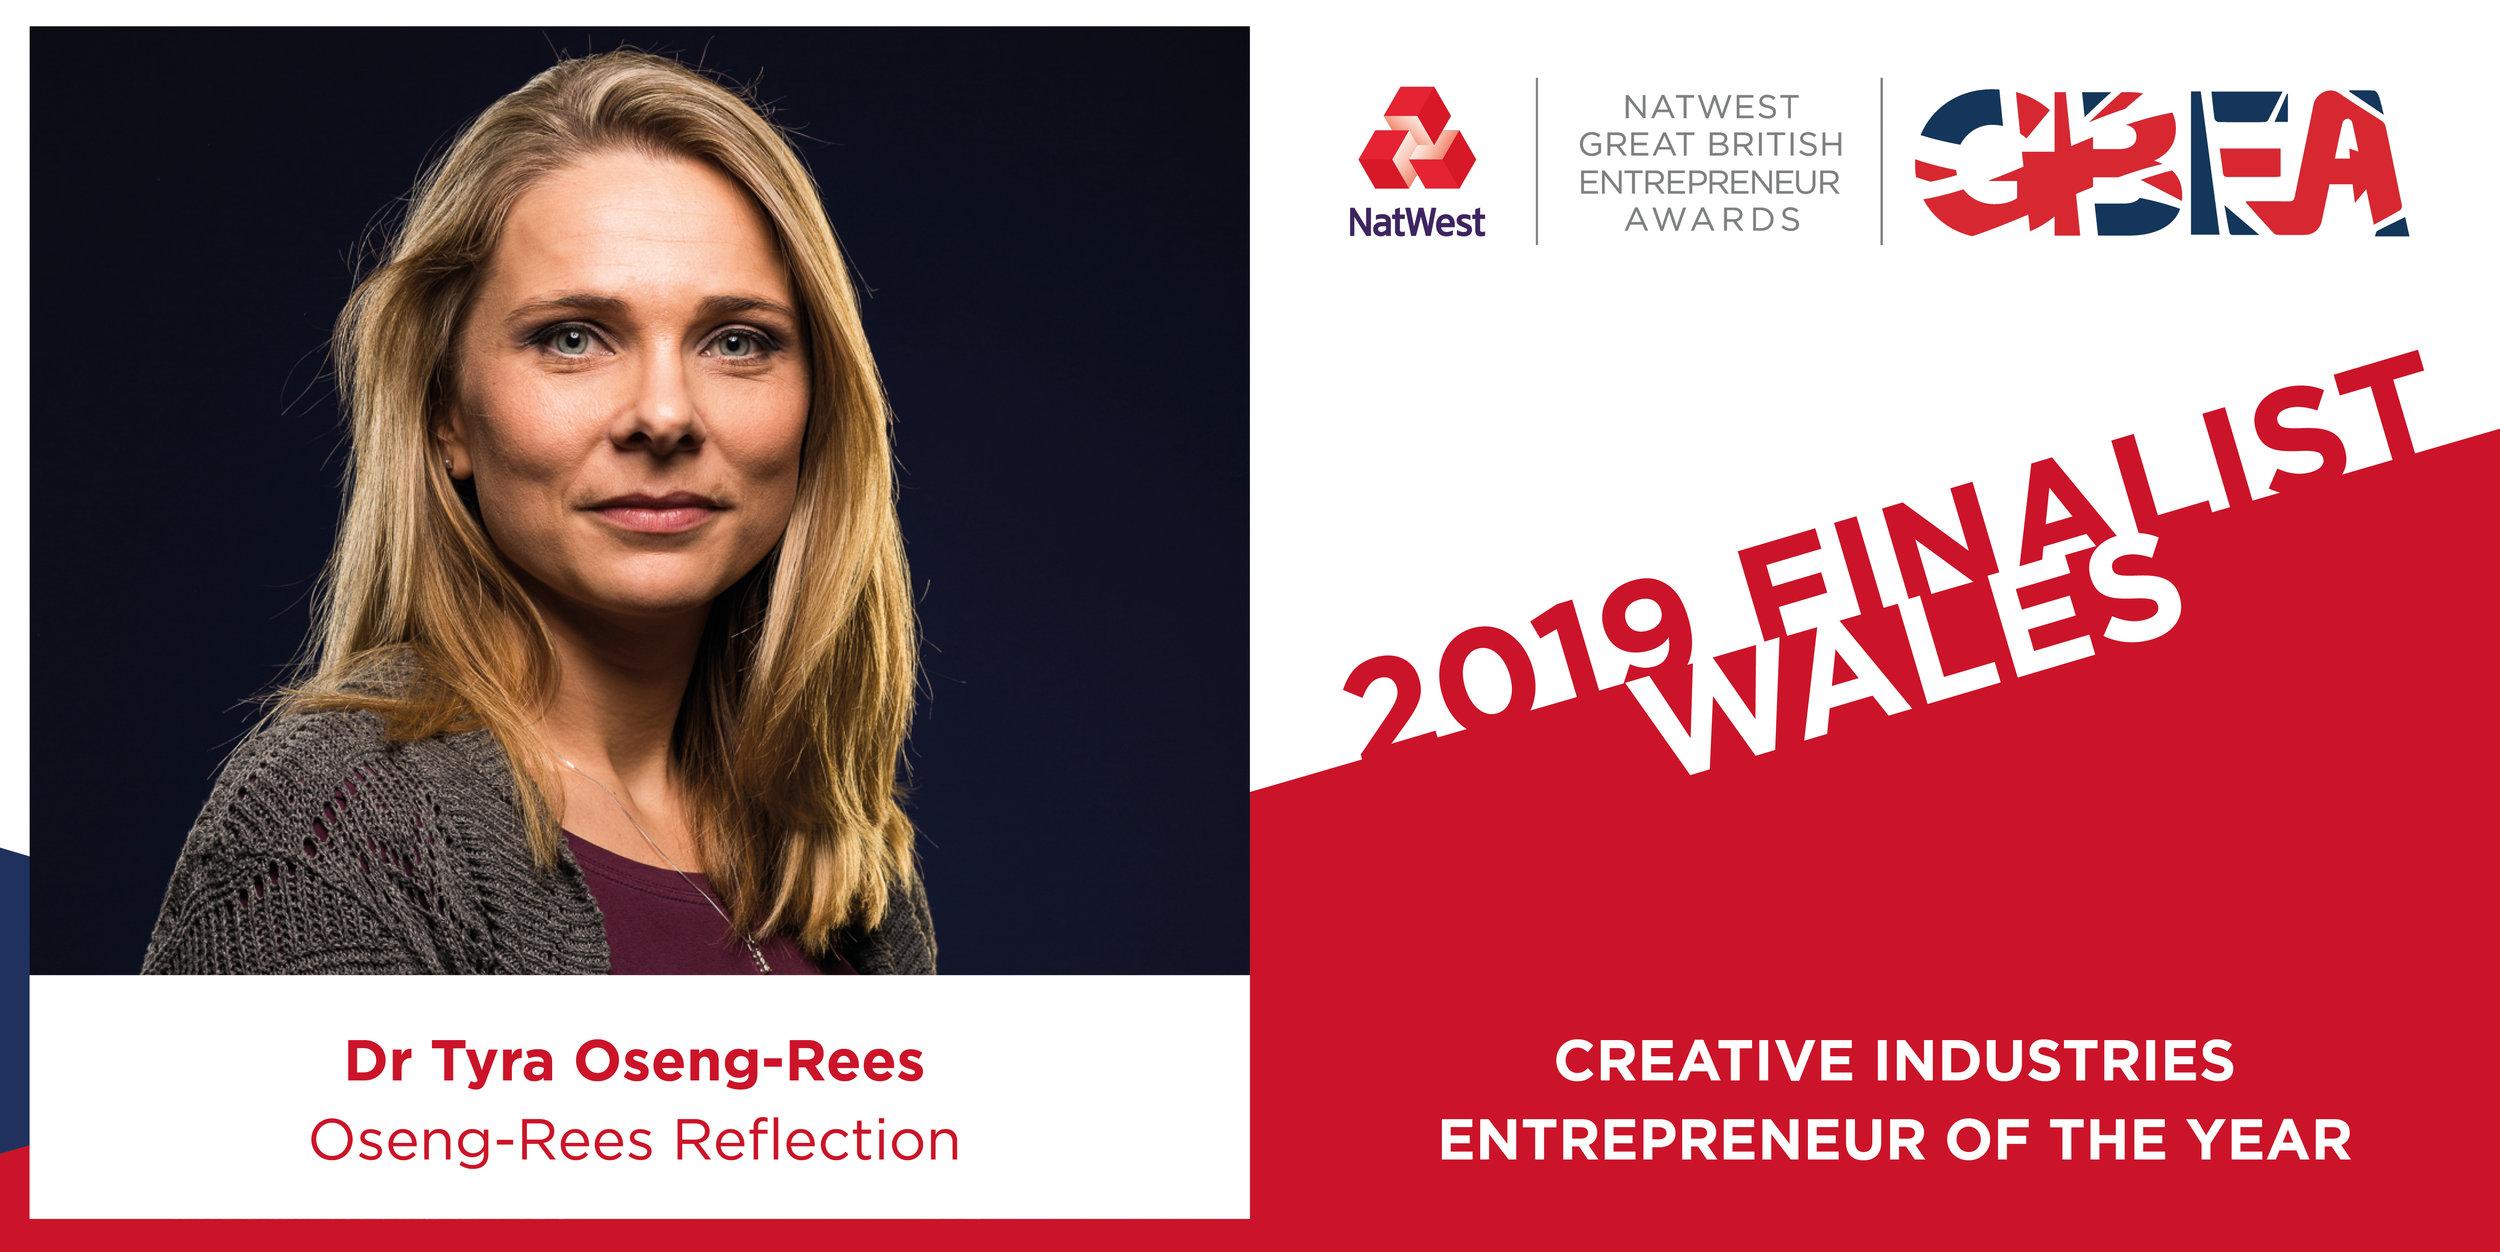 Great Britain Entrepreneur Award - Finalist: Creative Industries Entrepreneur of the Year 2019